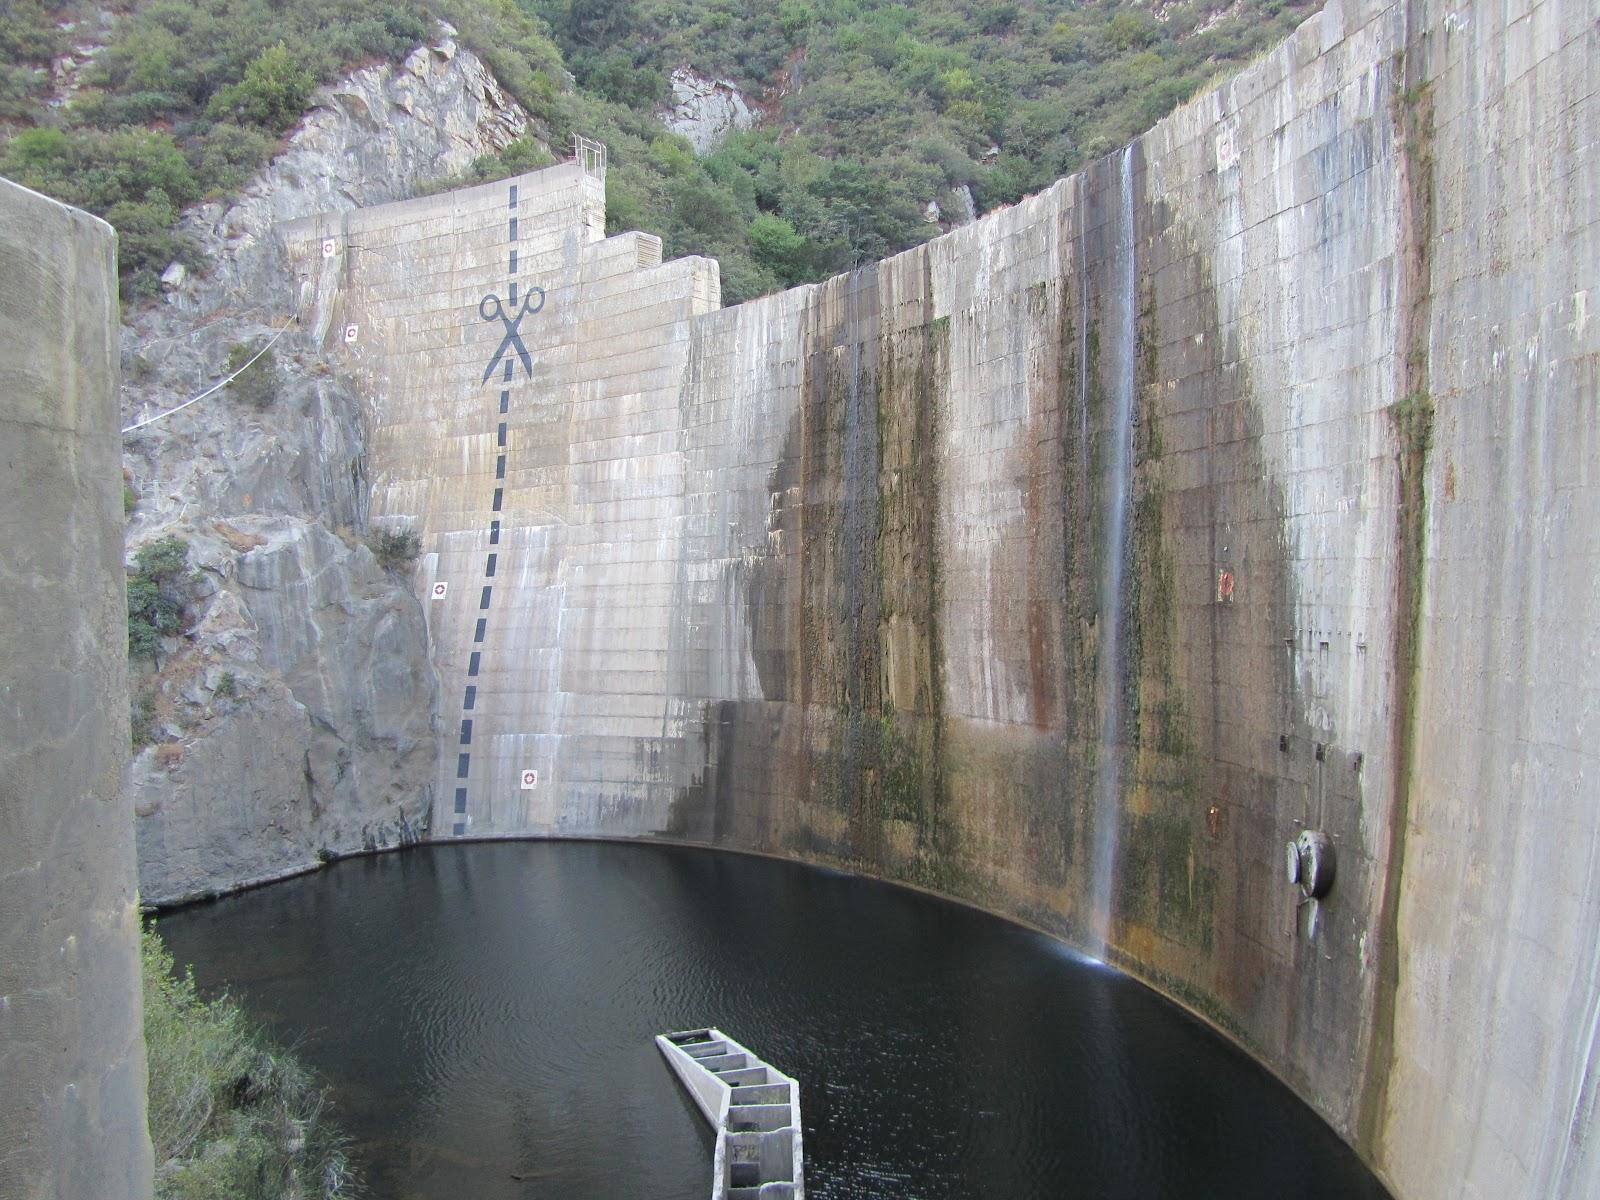 Ventura County Canyoneering 09 29 2012 Matilija Dam